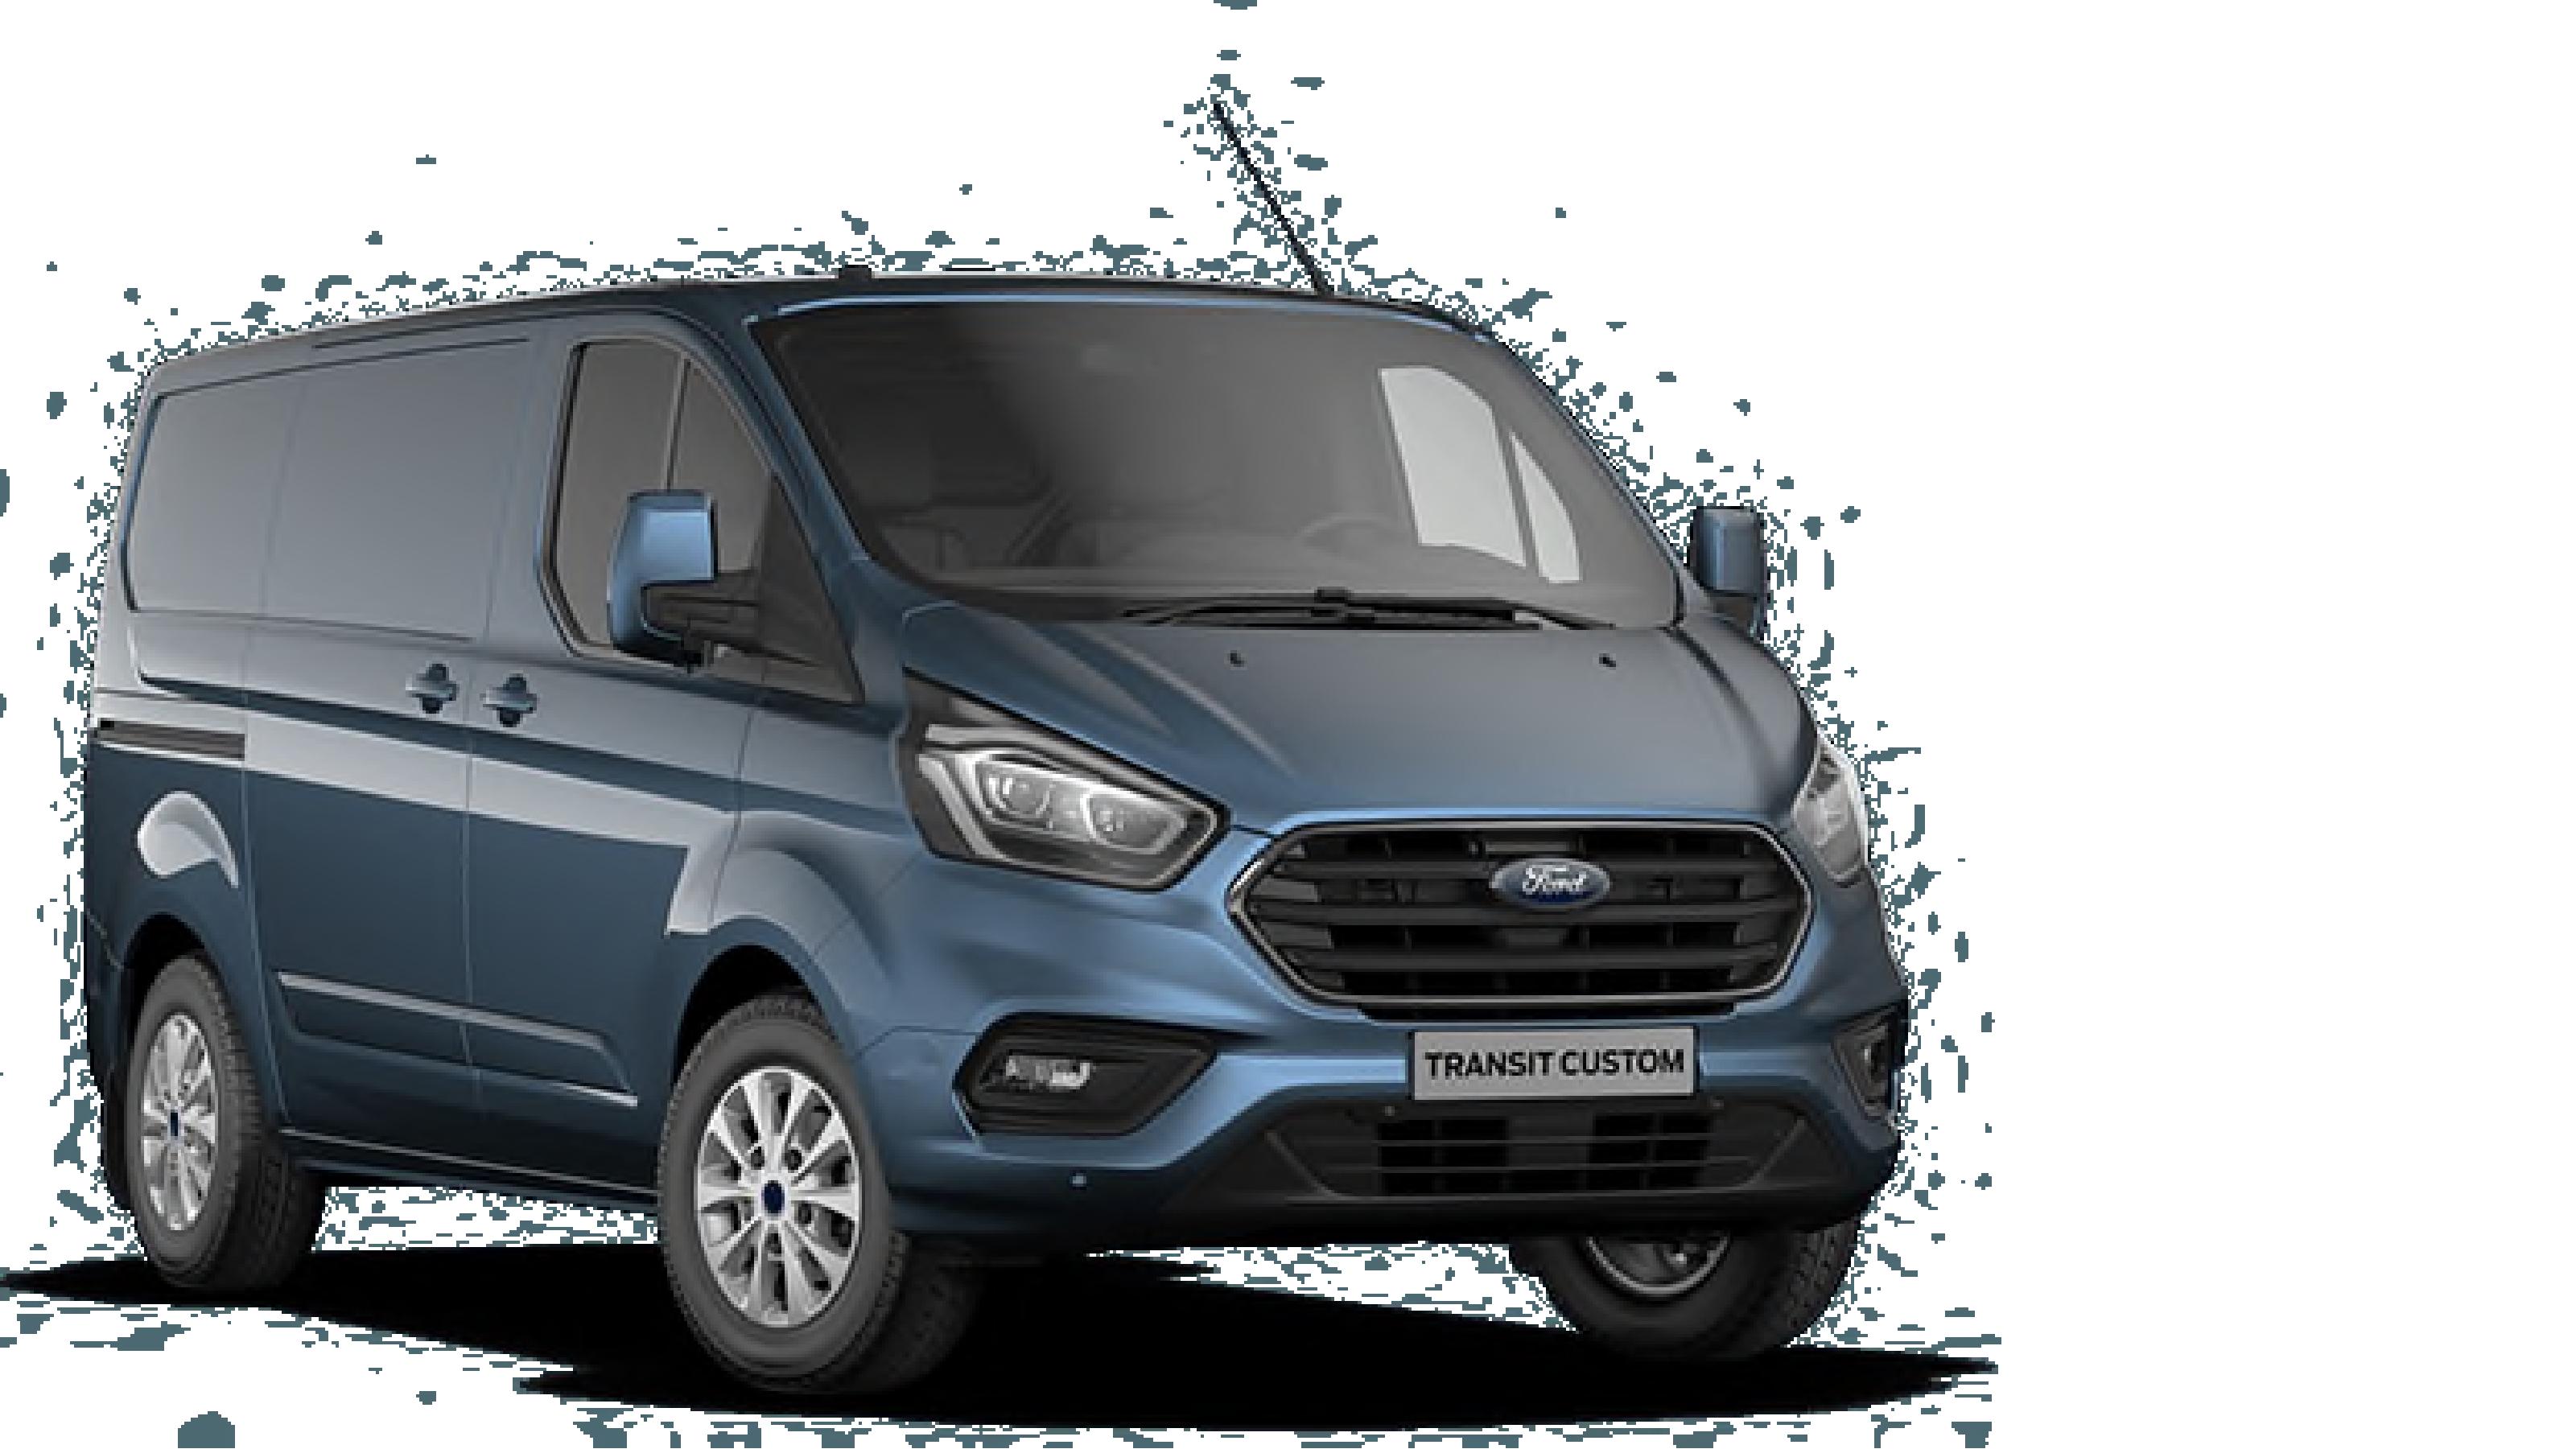 Ford Transit Custom tegel | Ford Poll